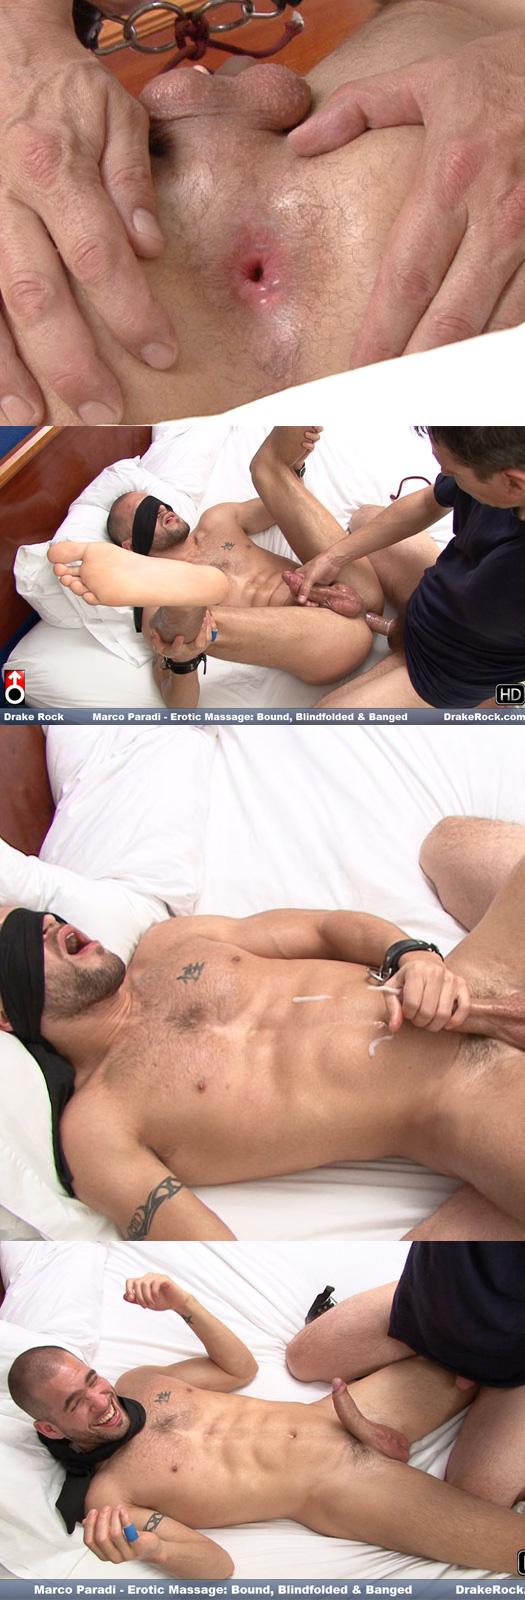 anna sensual massage gay bondage